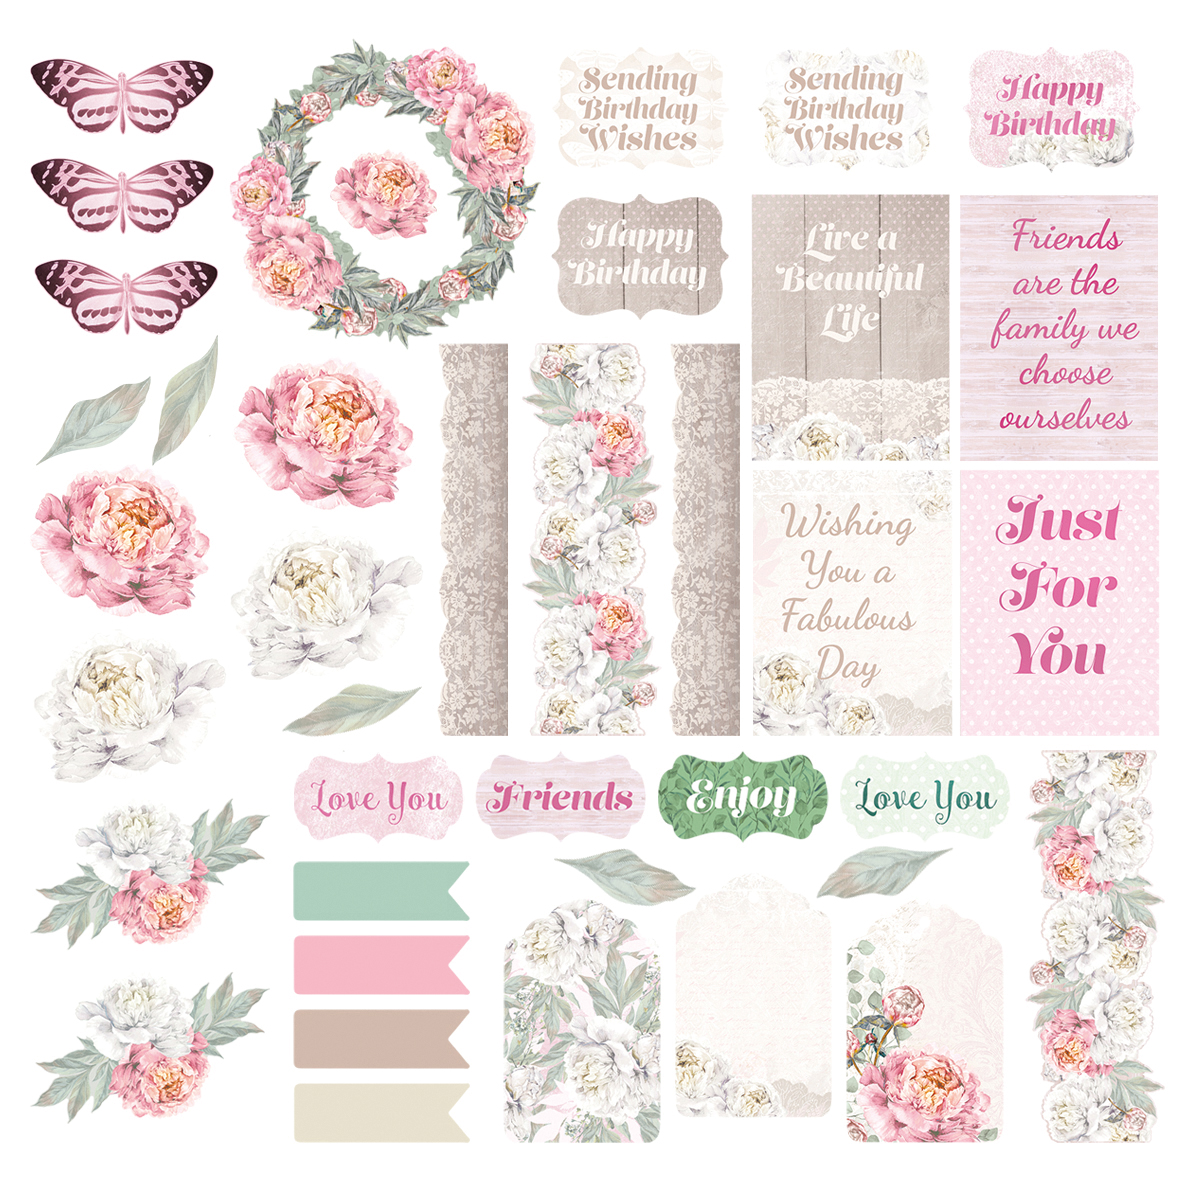 Couture Creations - Peaceful Peonies - Ephemera Pack